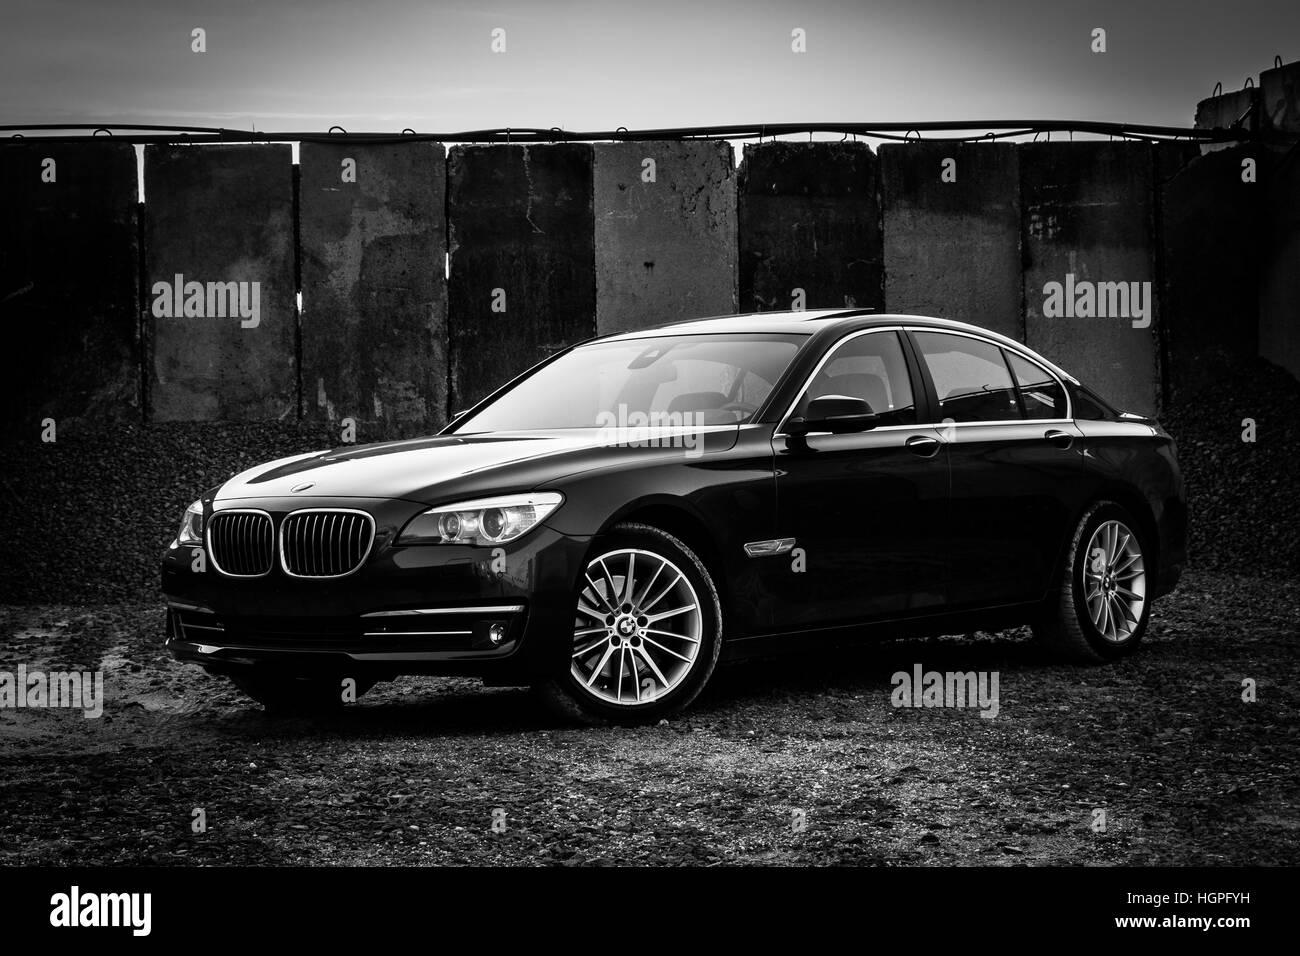 BMW 7 Series 750i 750d Xdrive F01 LCI Wallpaper Background